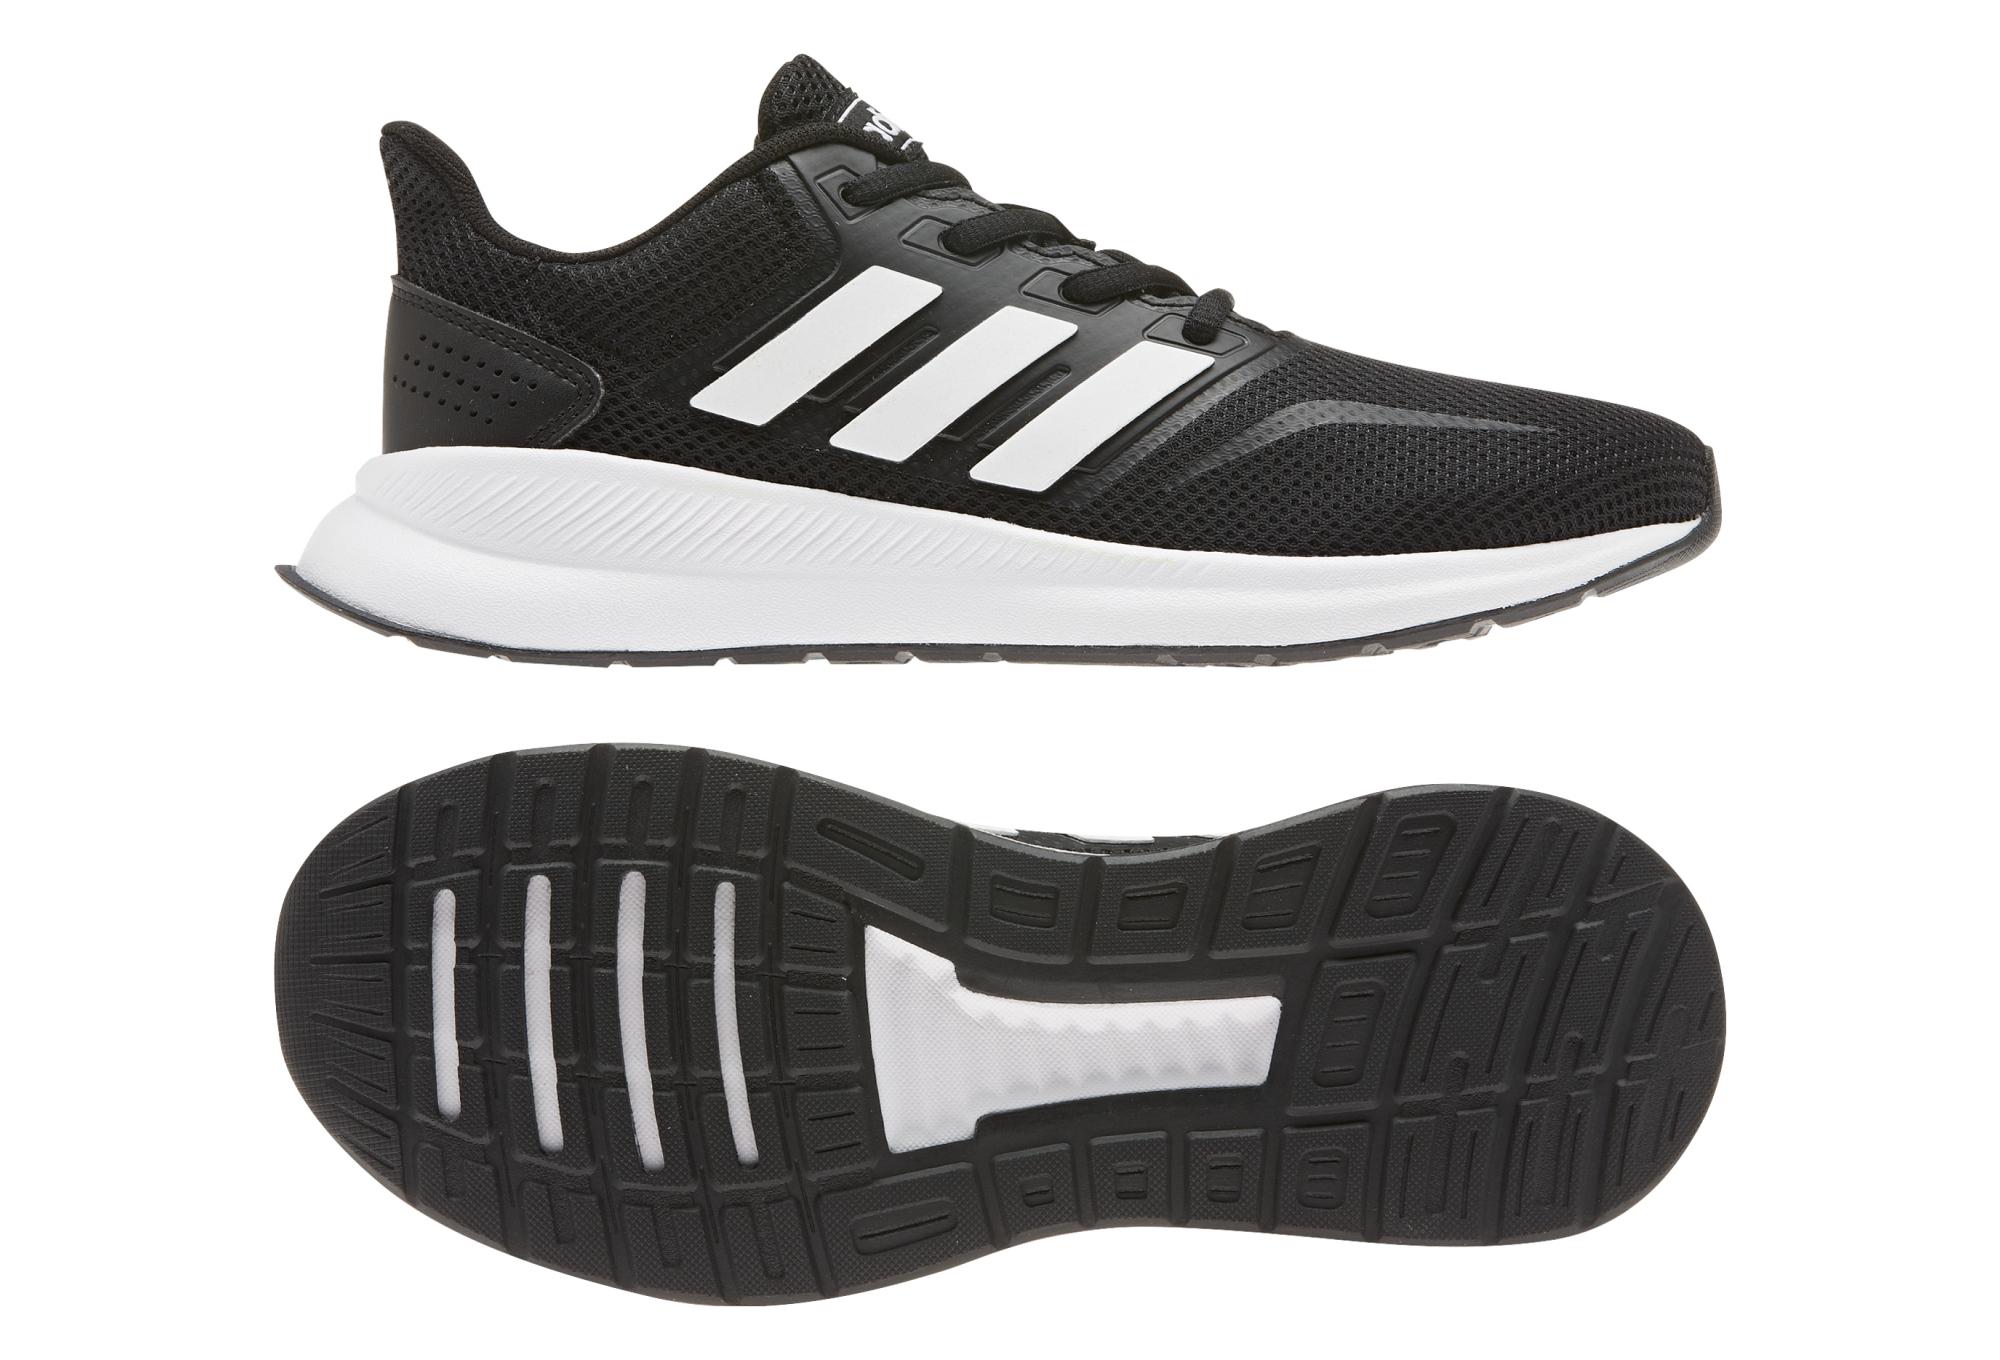 Chaussures junior adidas Runfalcon | Alltricks.com